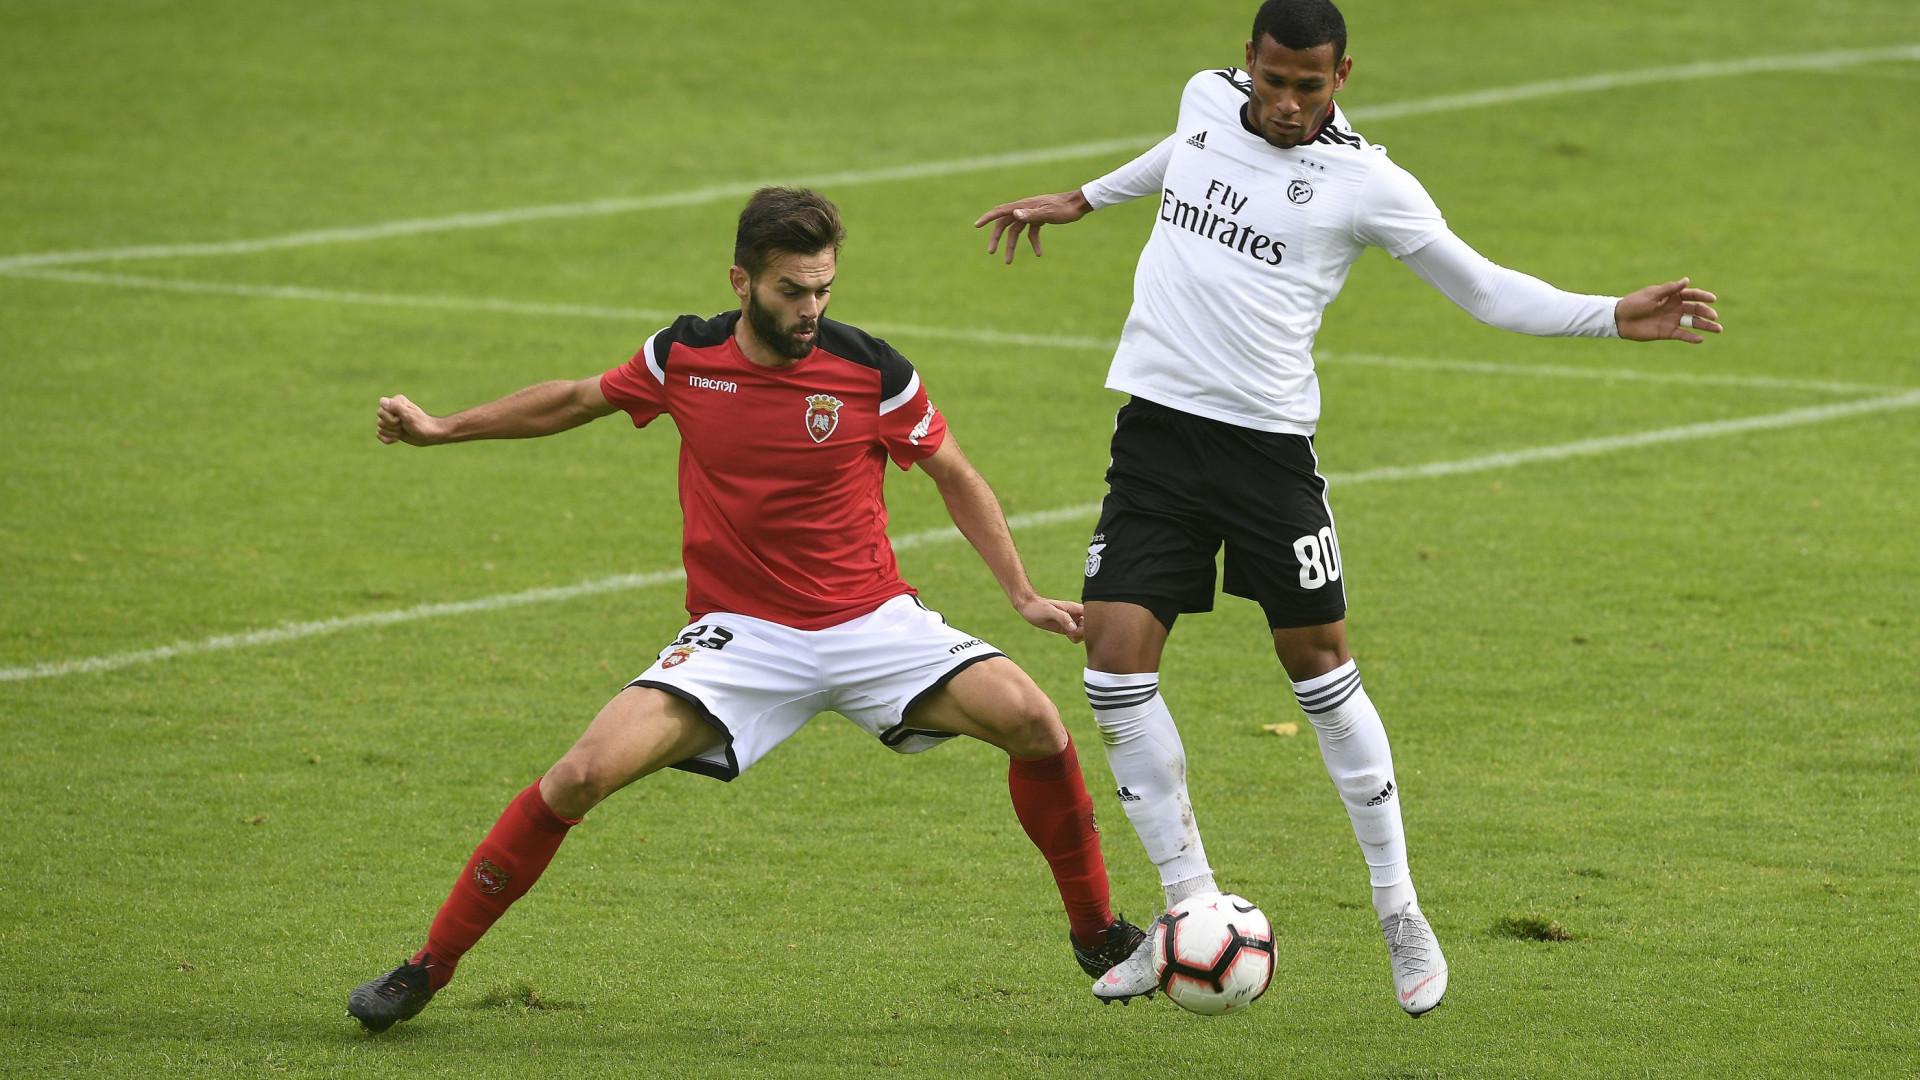 Benfica B soma segunda derrota consecutiva ao perder com Penafiel